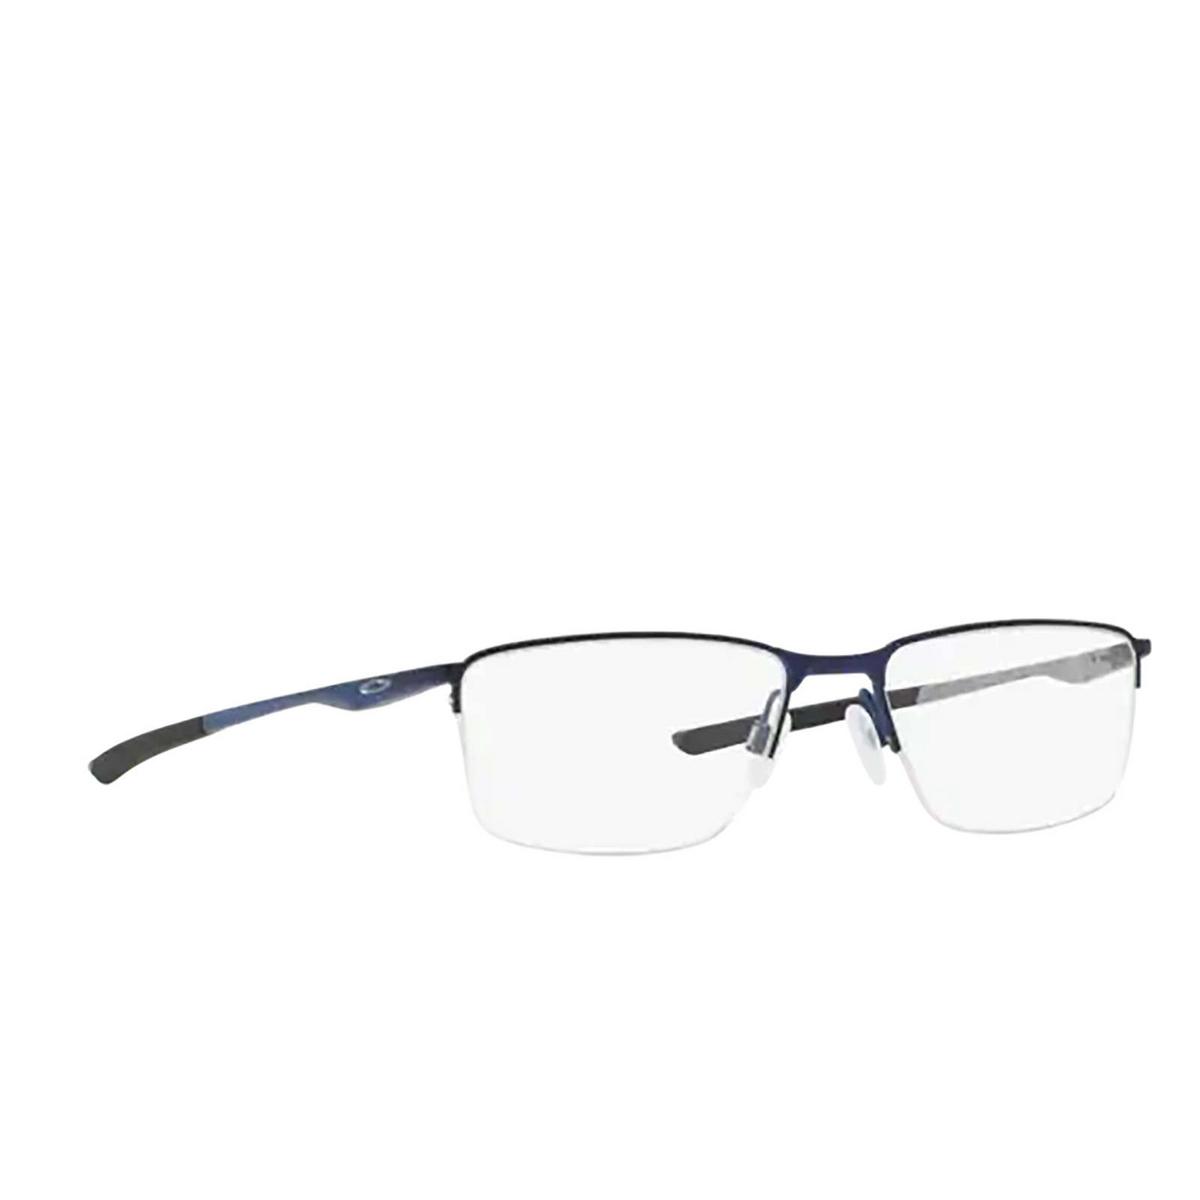 Oakley® Rectangle Eyeglasses: Socket 5.5 OX3218 color Matte Midnight 321803 - three-quarters view.